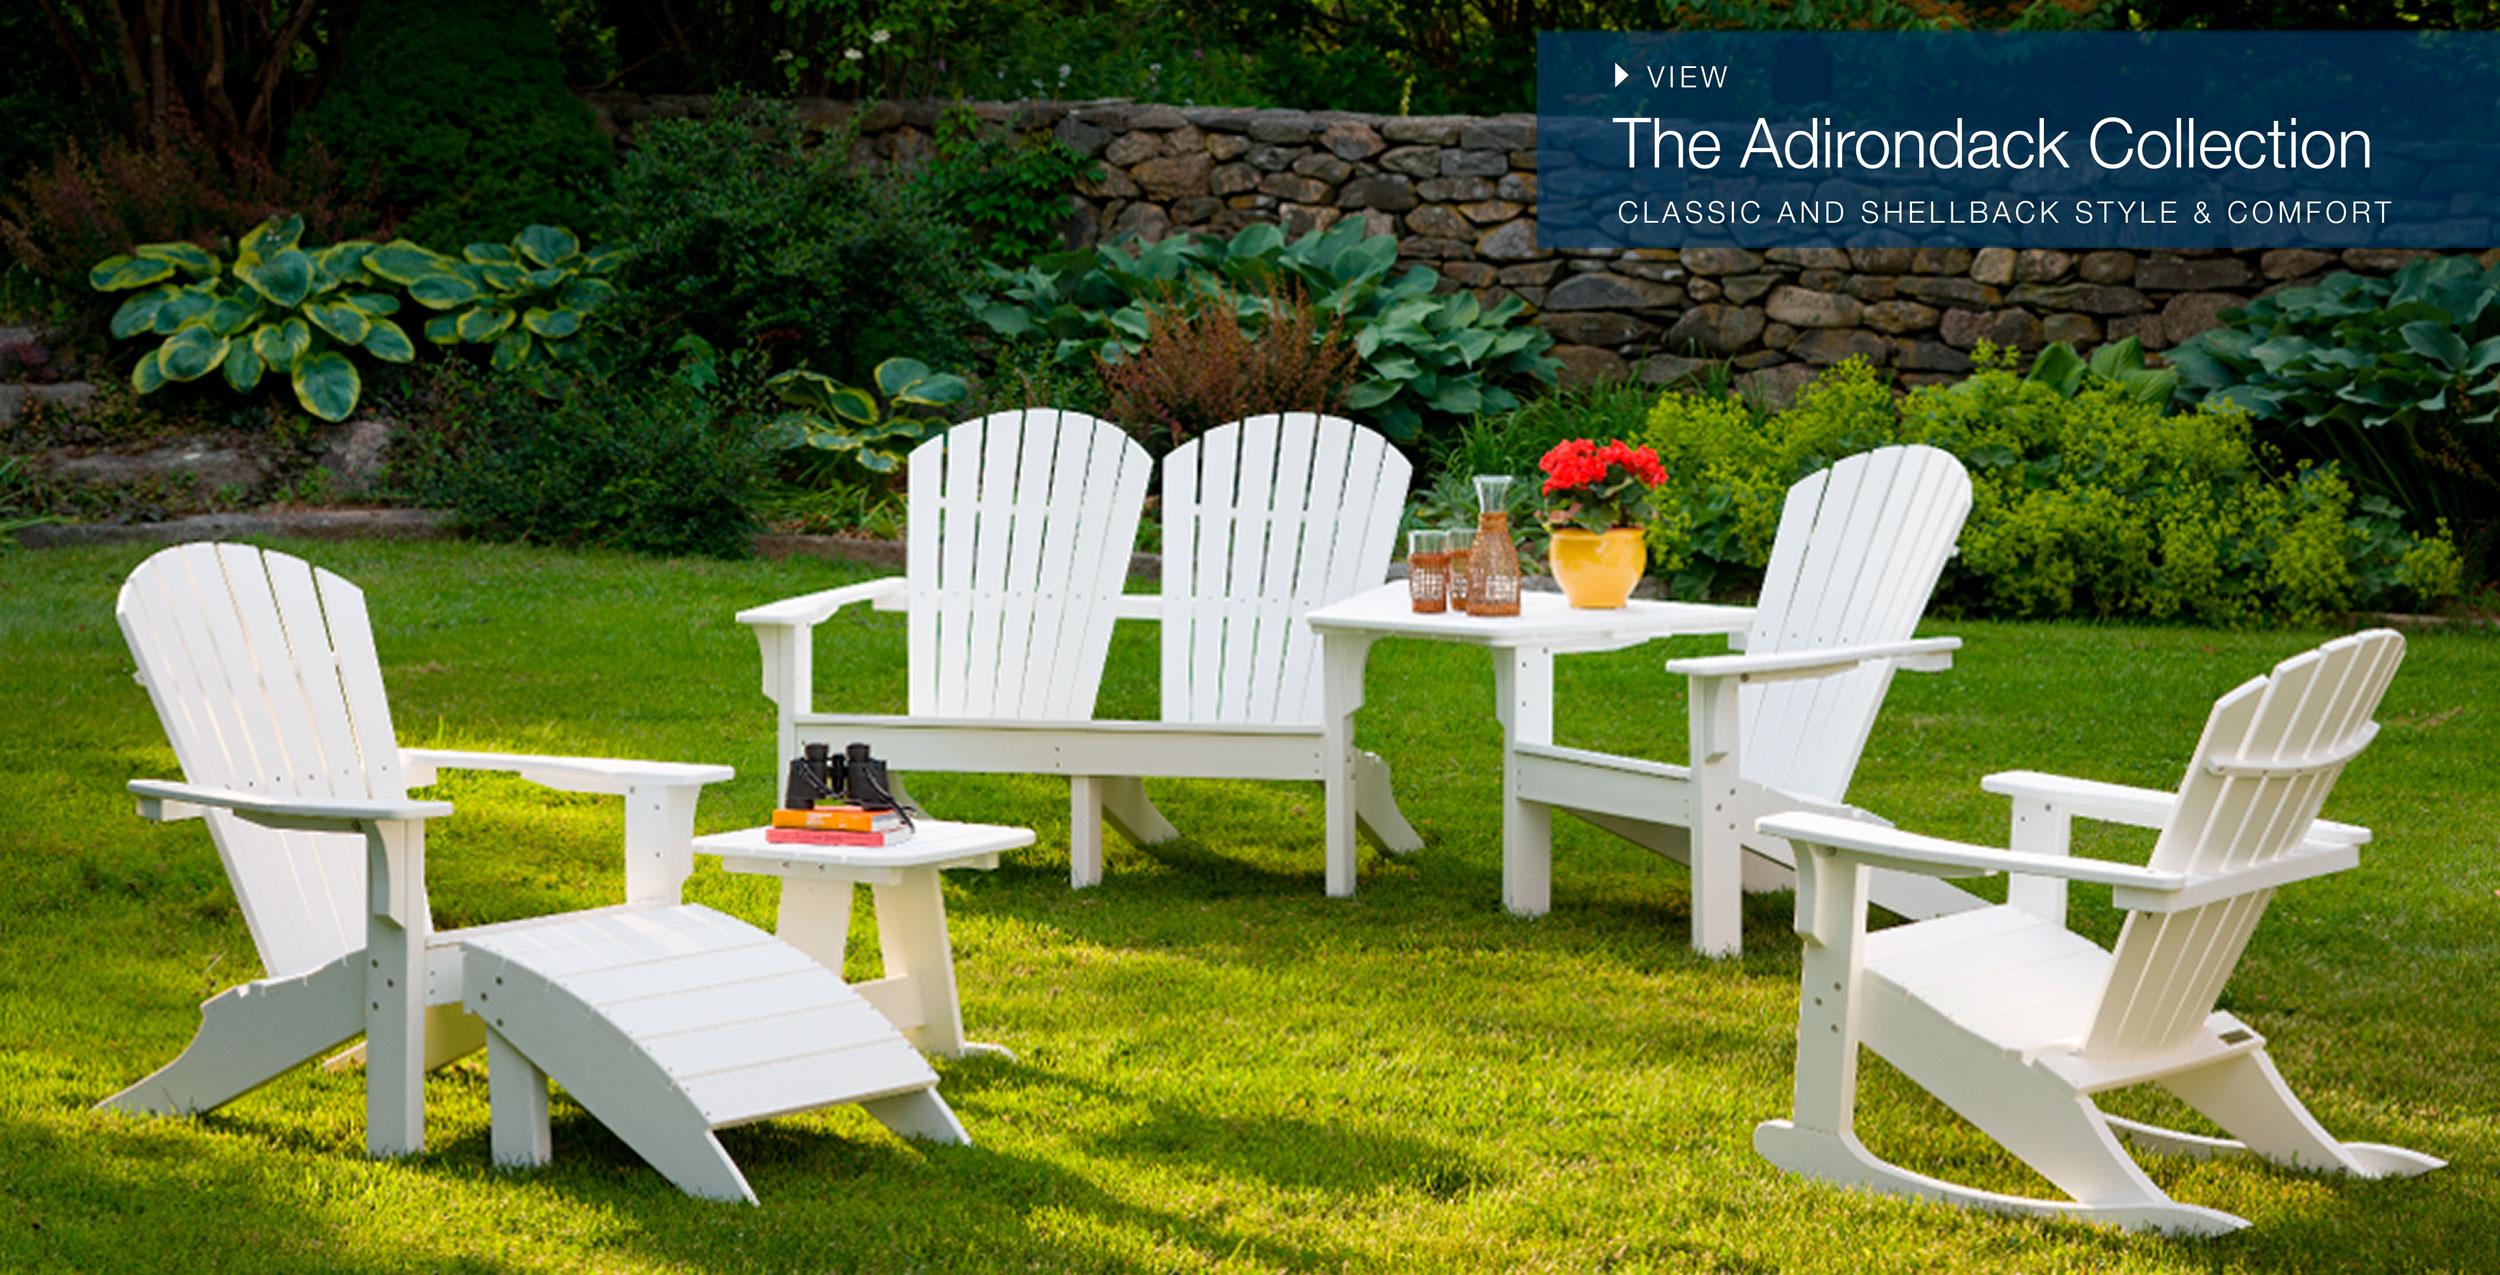 Adirondack Classic Collection